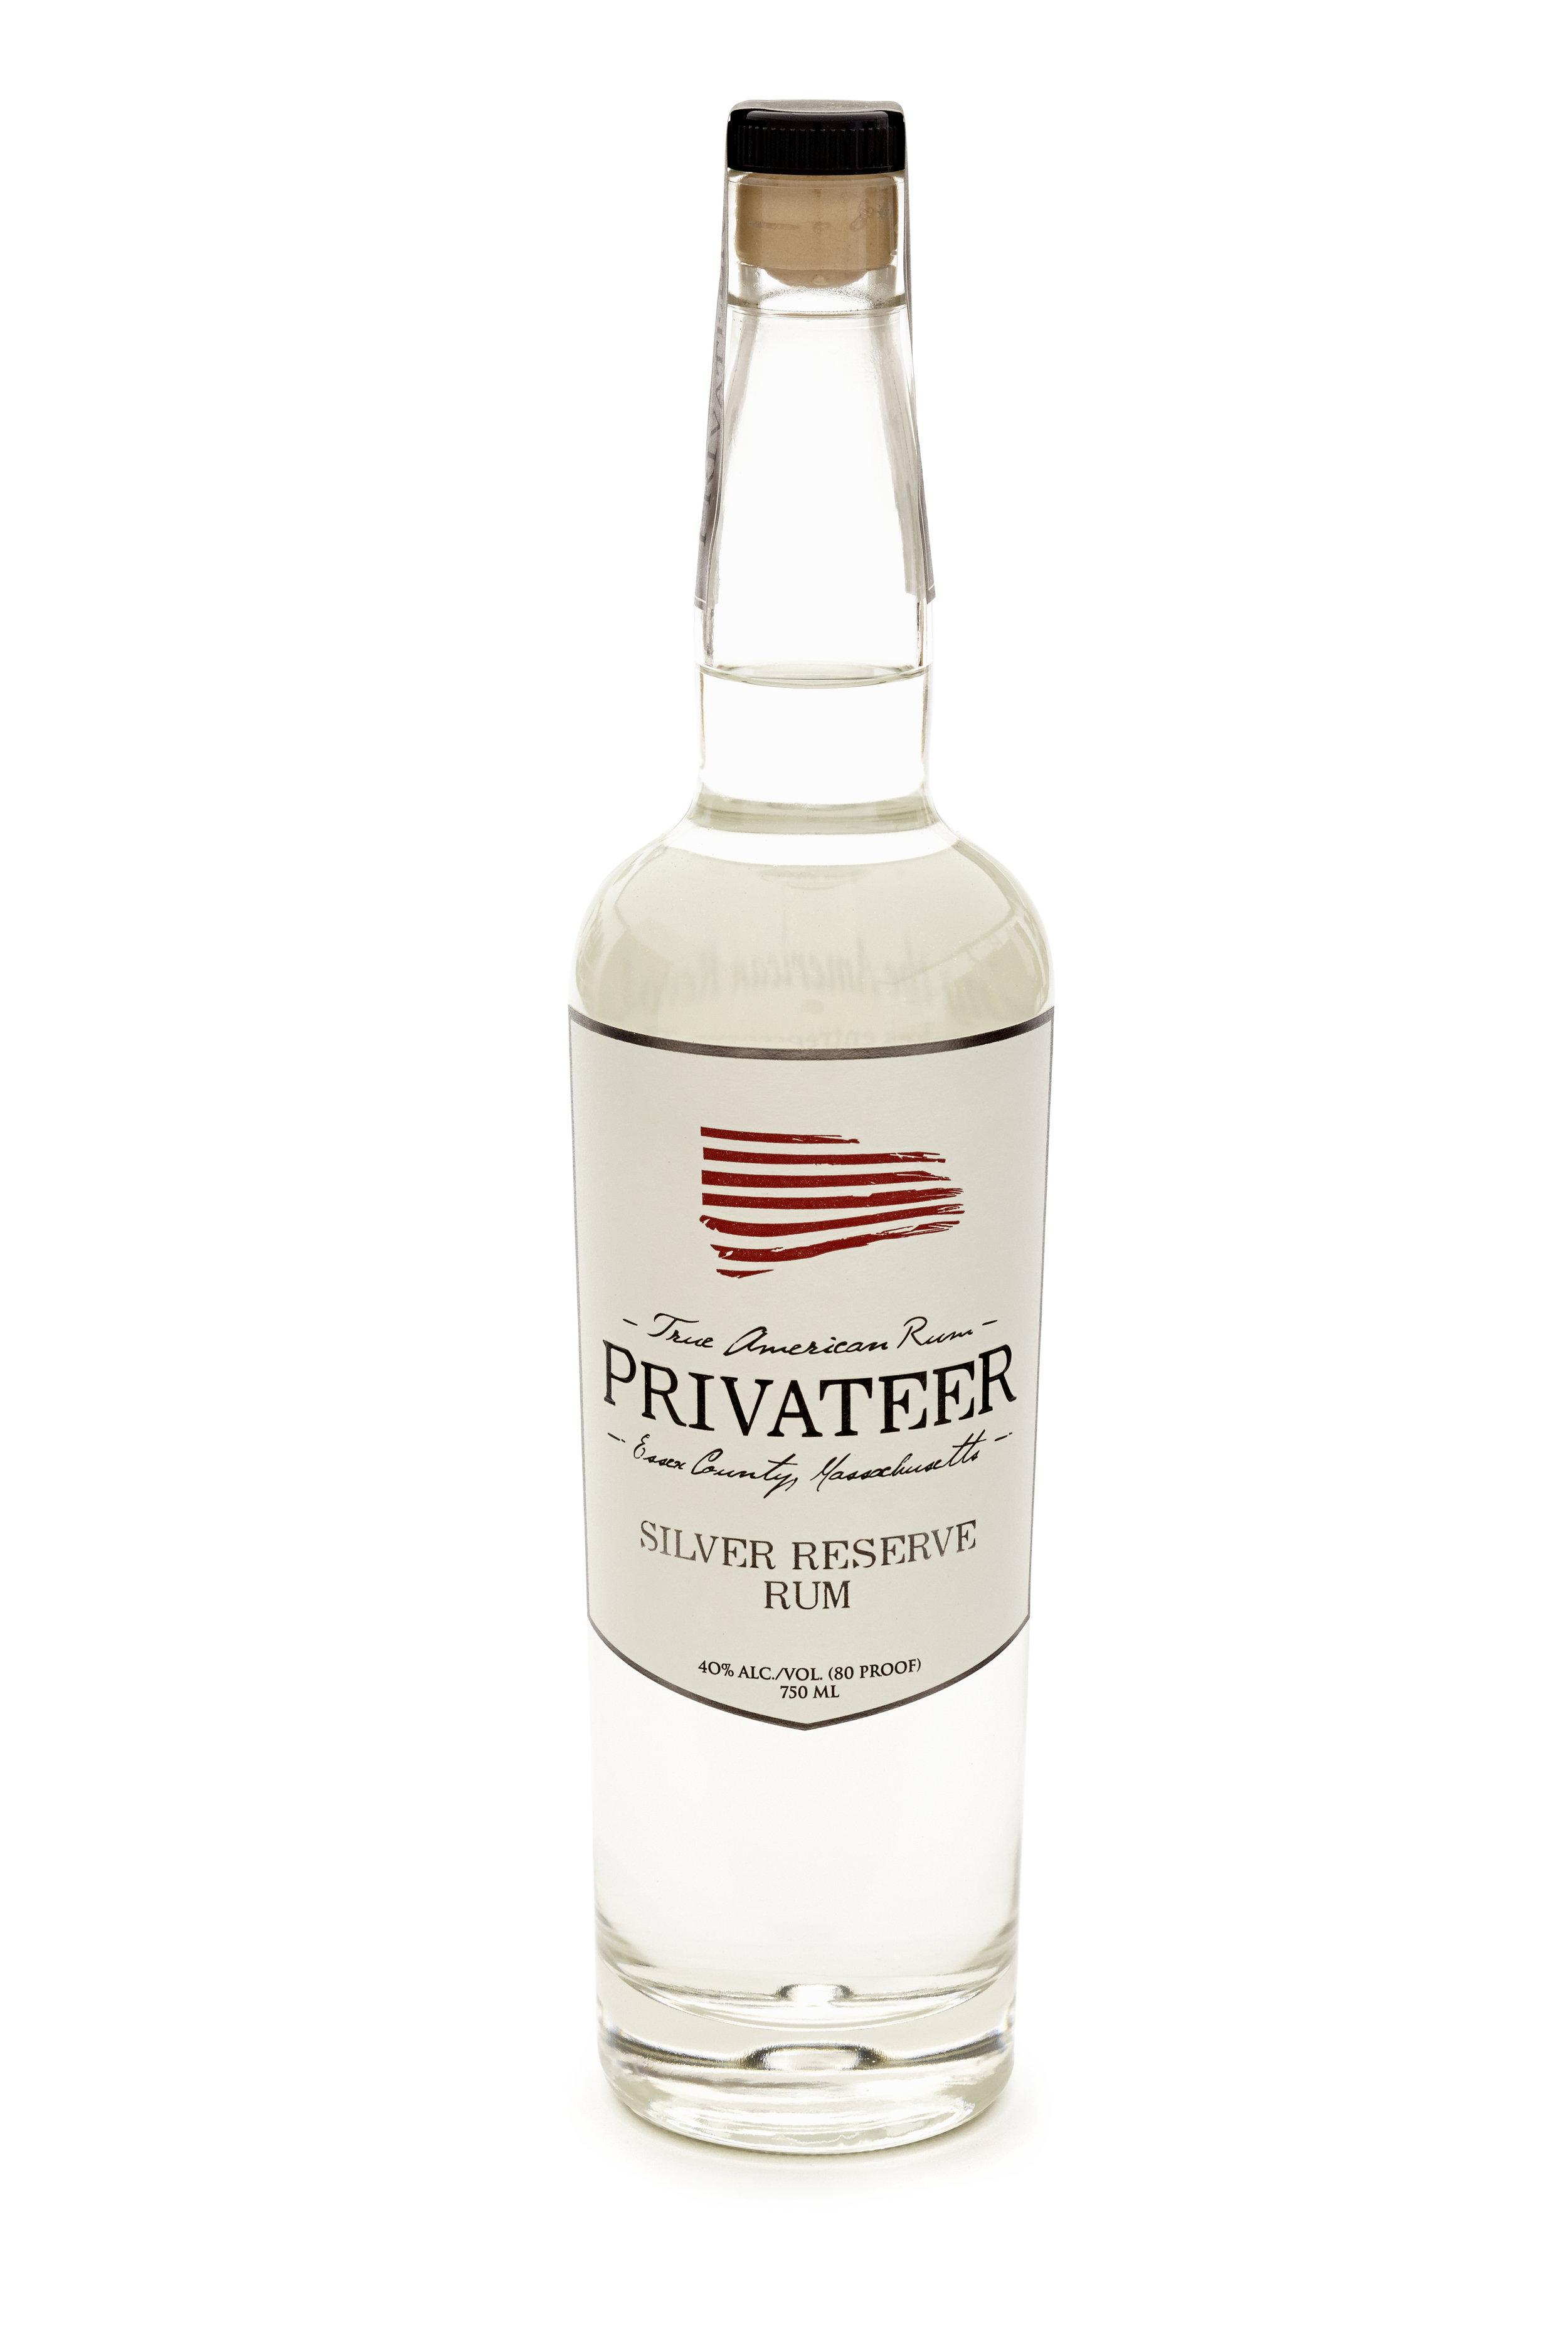 craft-spirits-rum-privateer-silver